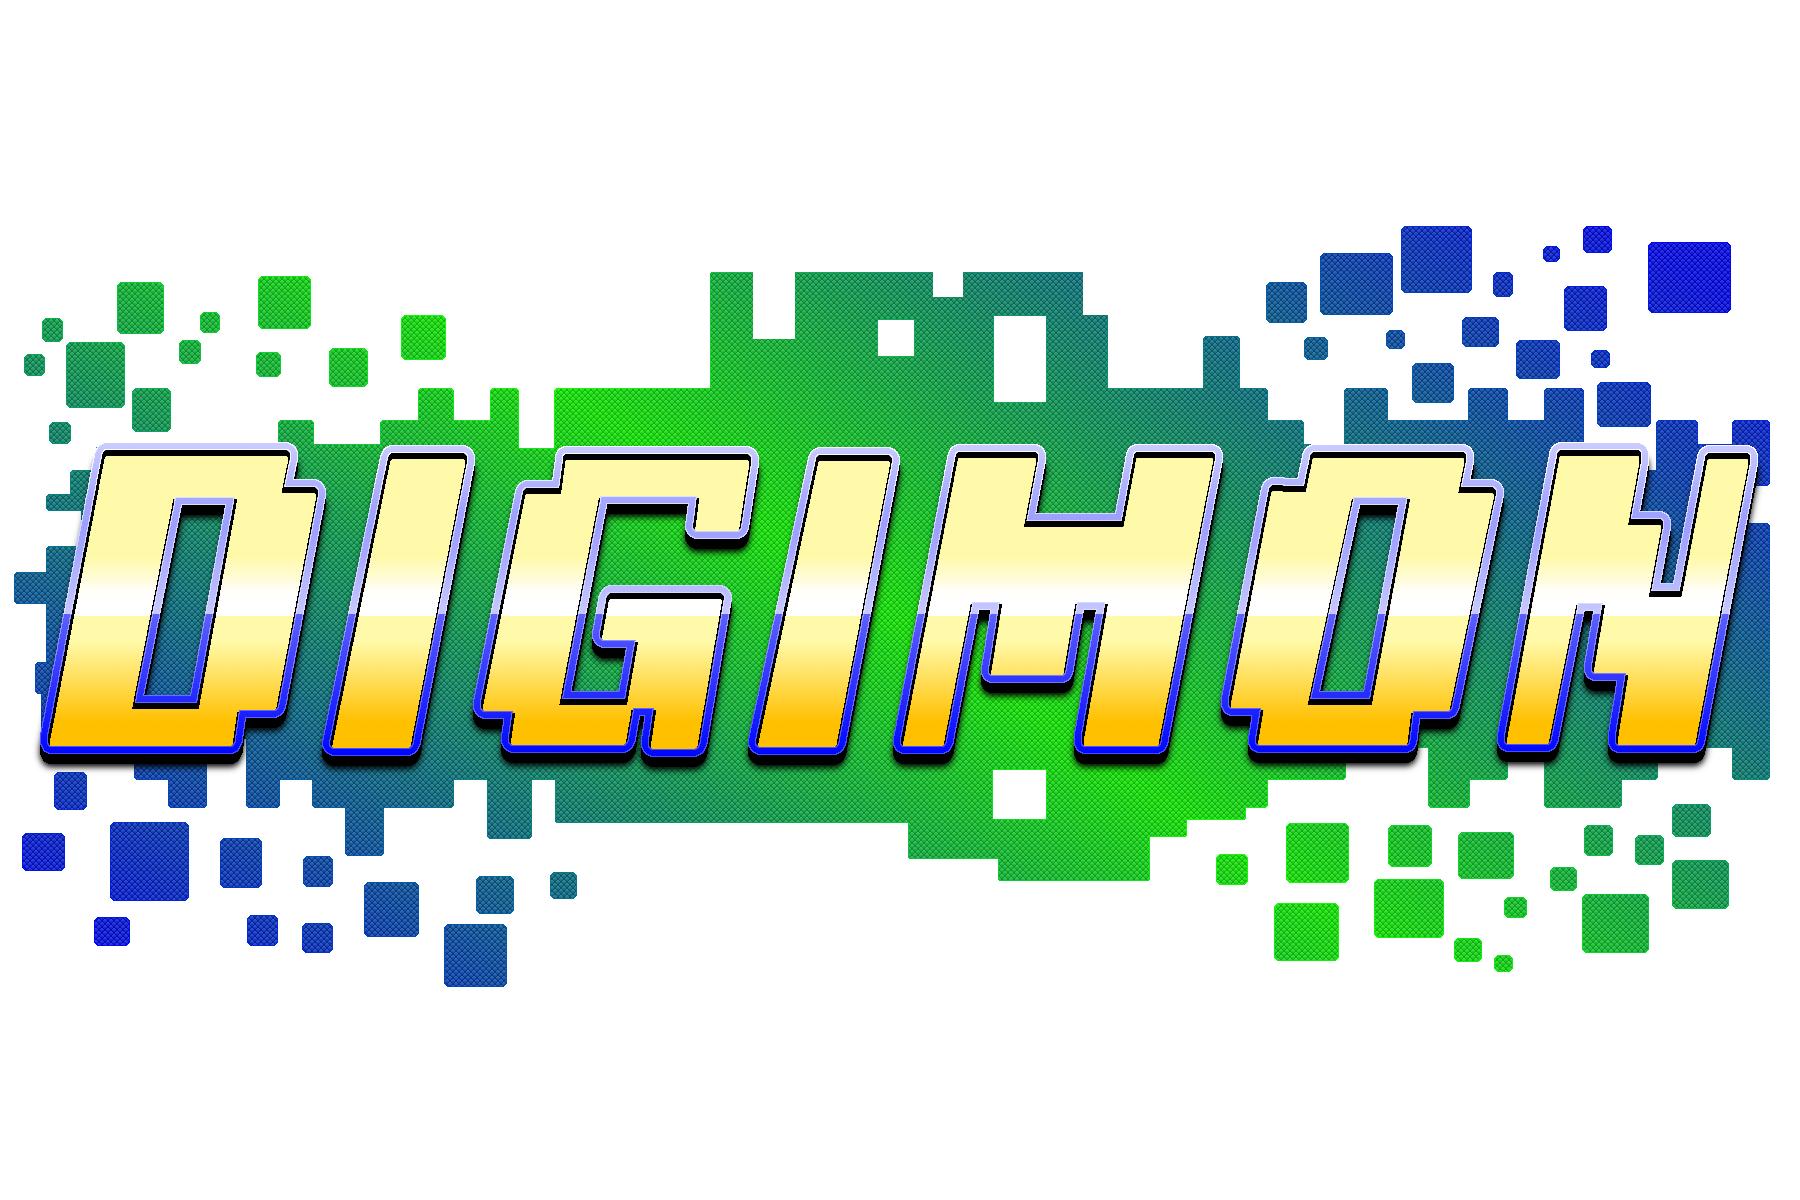 Digimon Digivice App The New Digimon V-pet App For